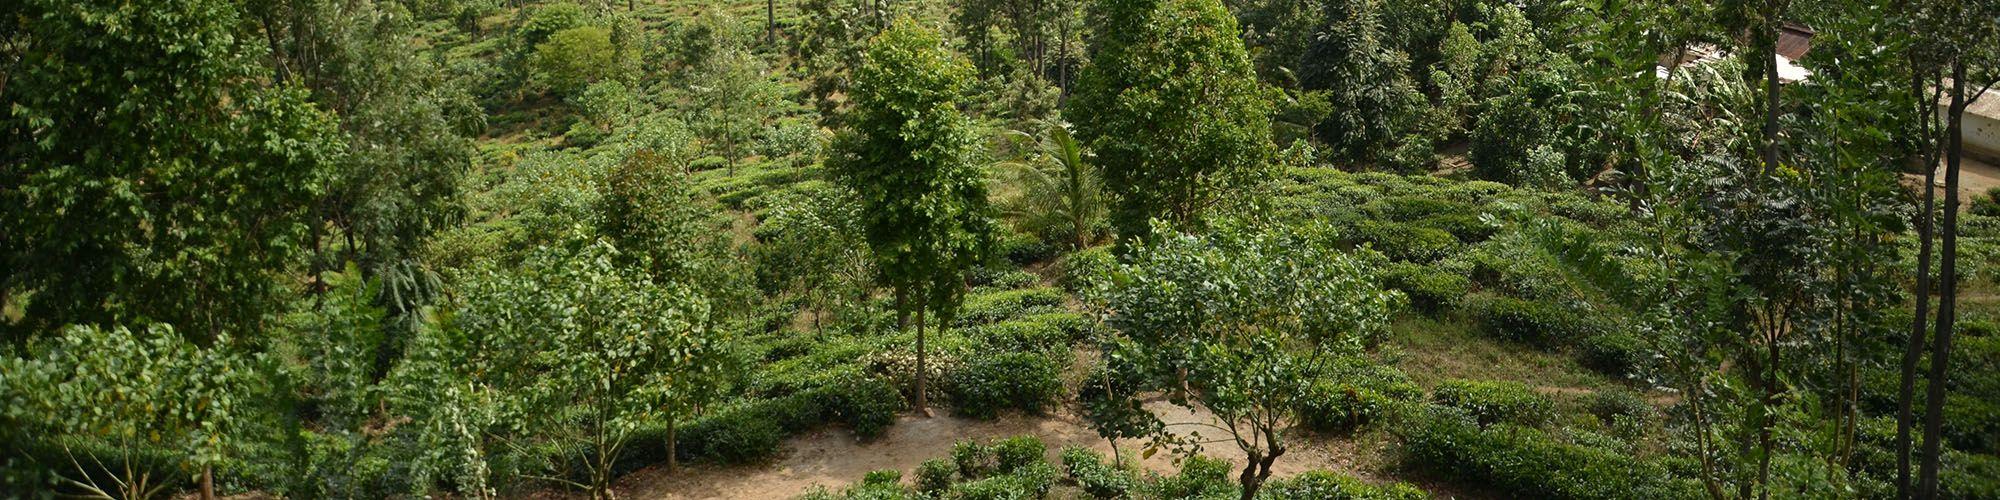 Sri Lanka, Bandarawela, Berg, Wanderung